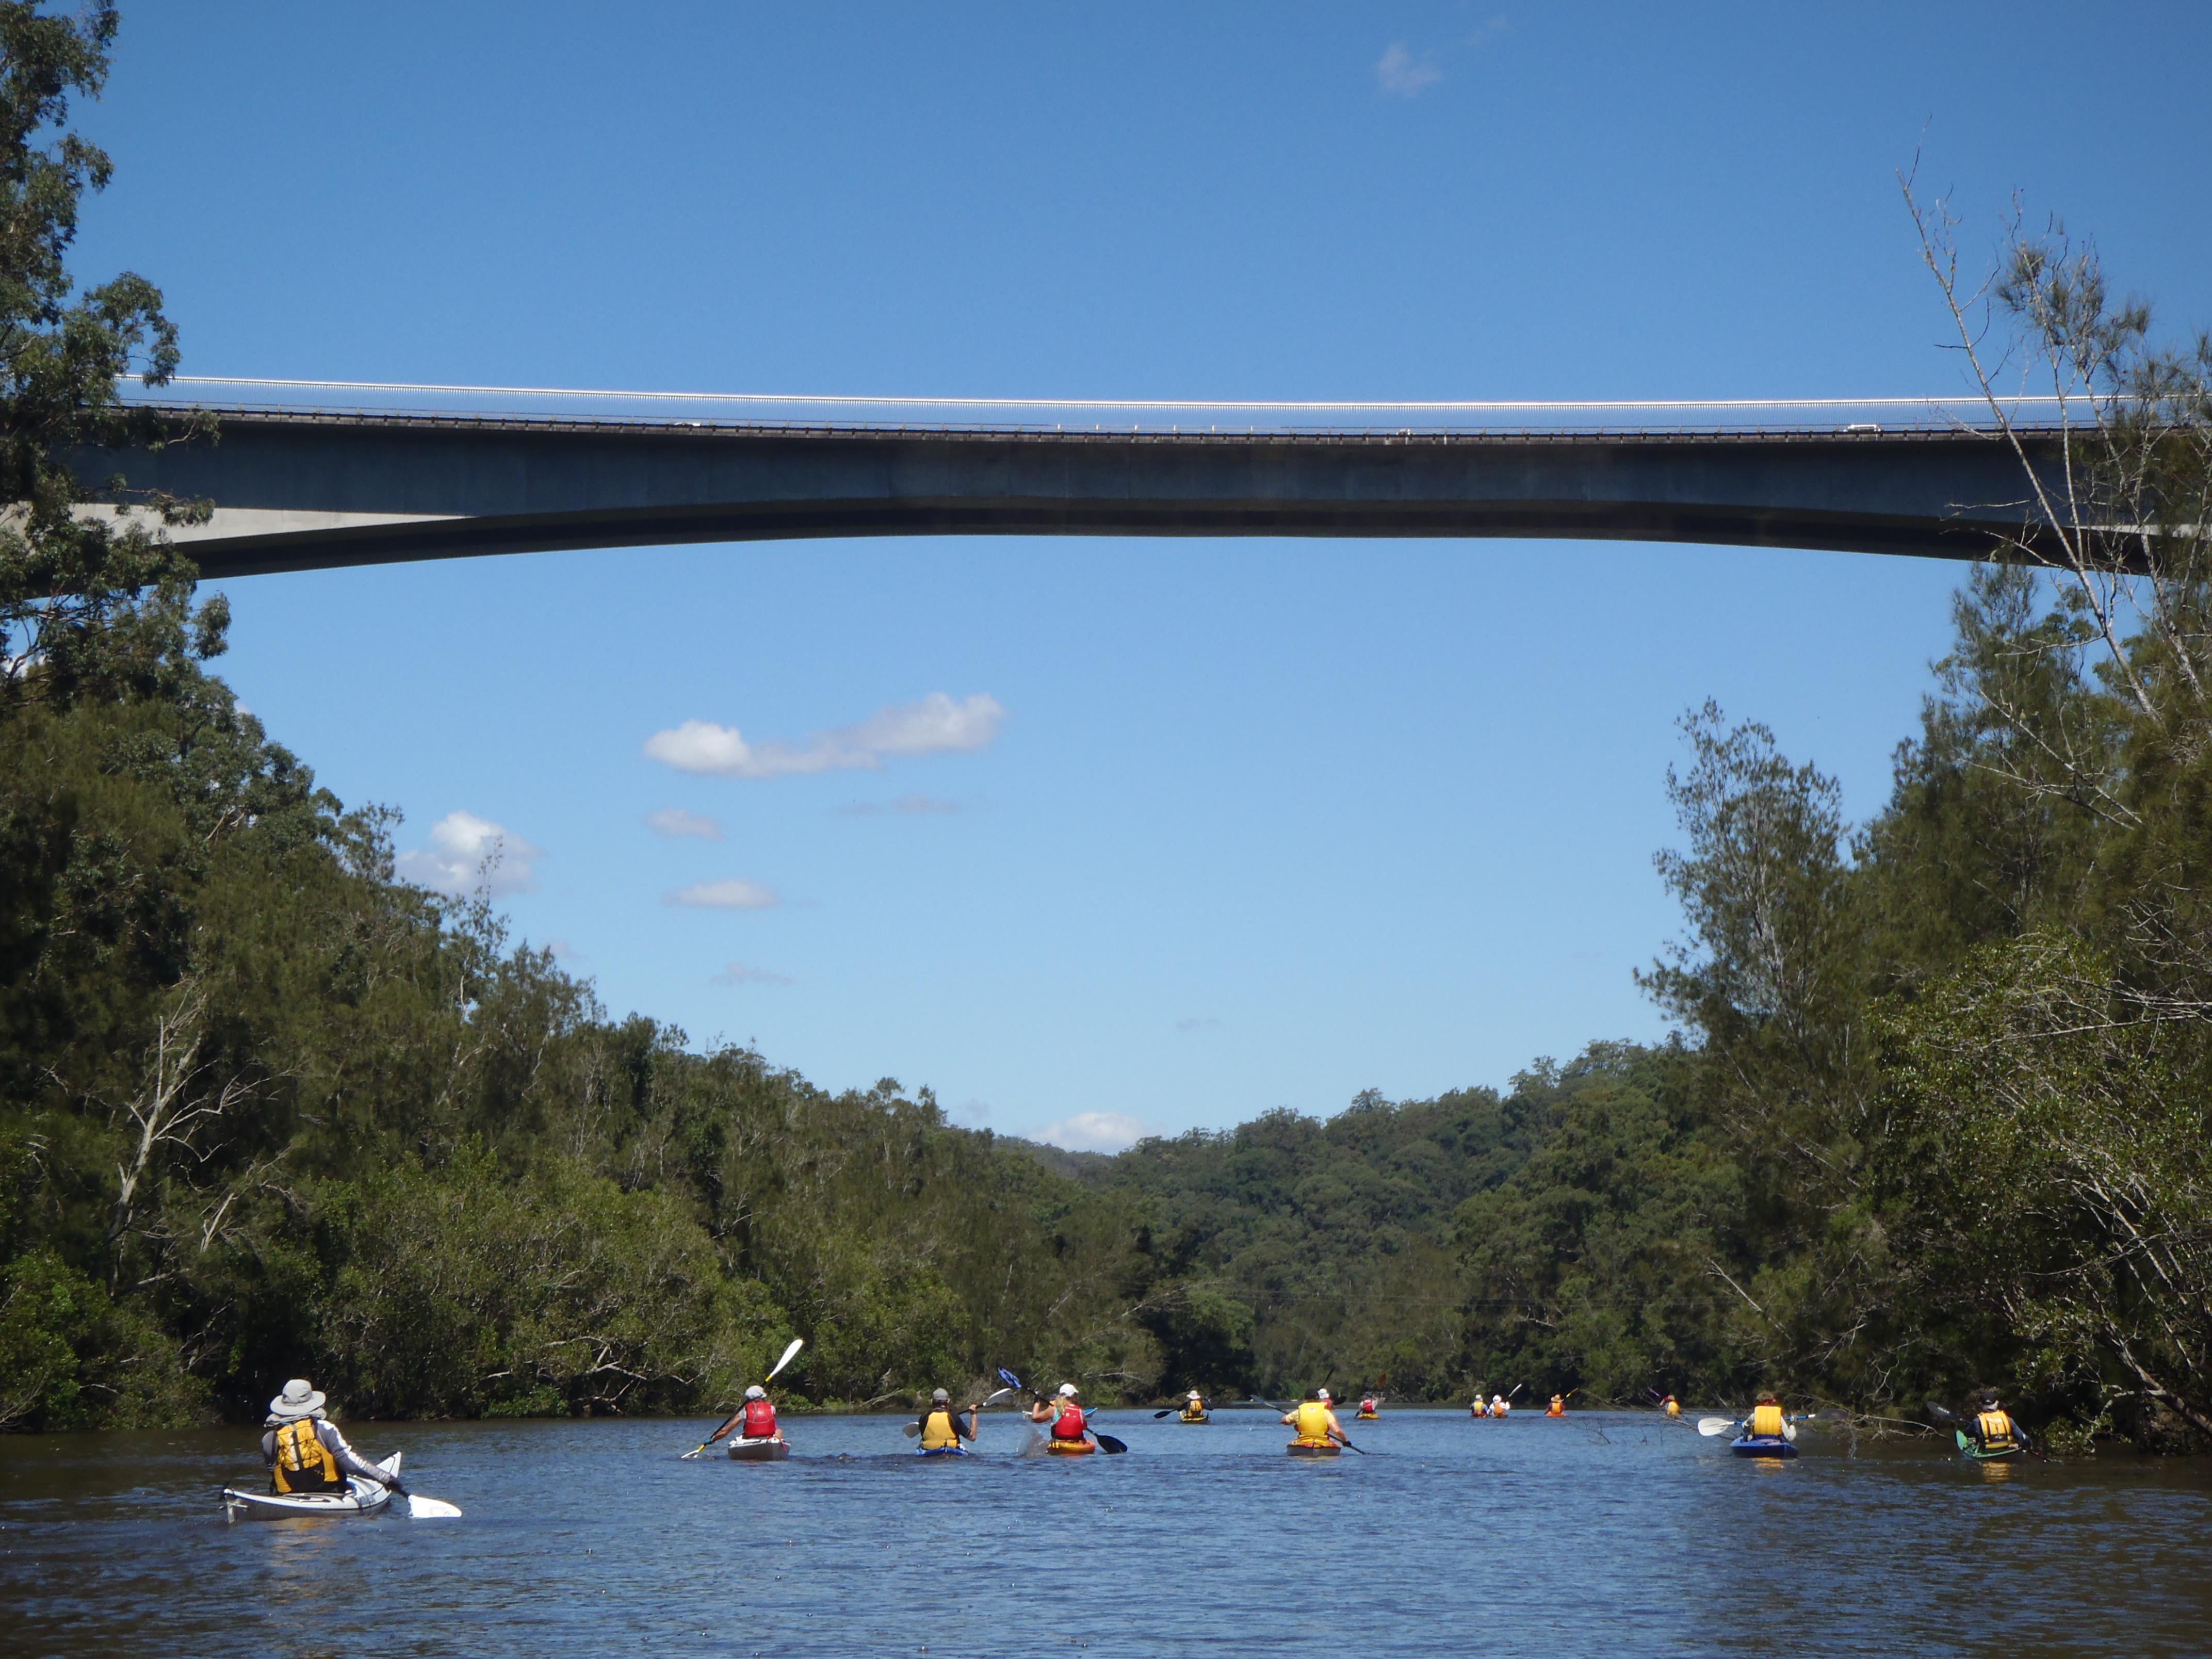 Copy (2) of Mooney Mooney bridge